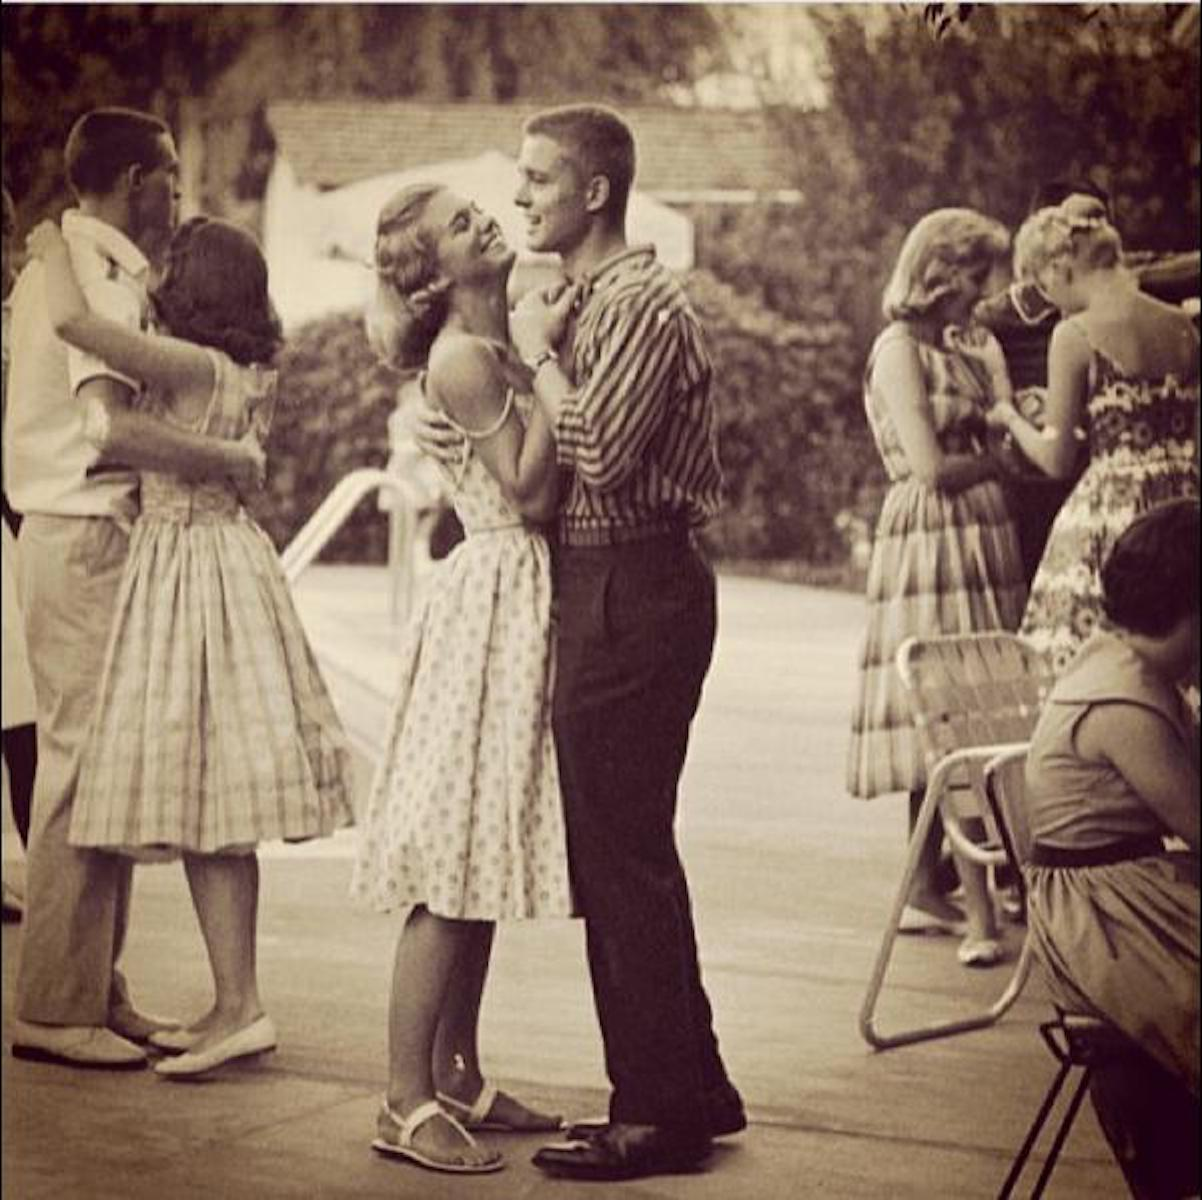 vintage teen couple dancing outside ini 1950s